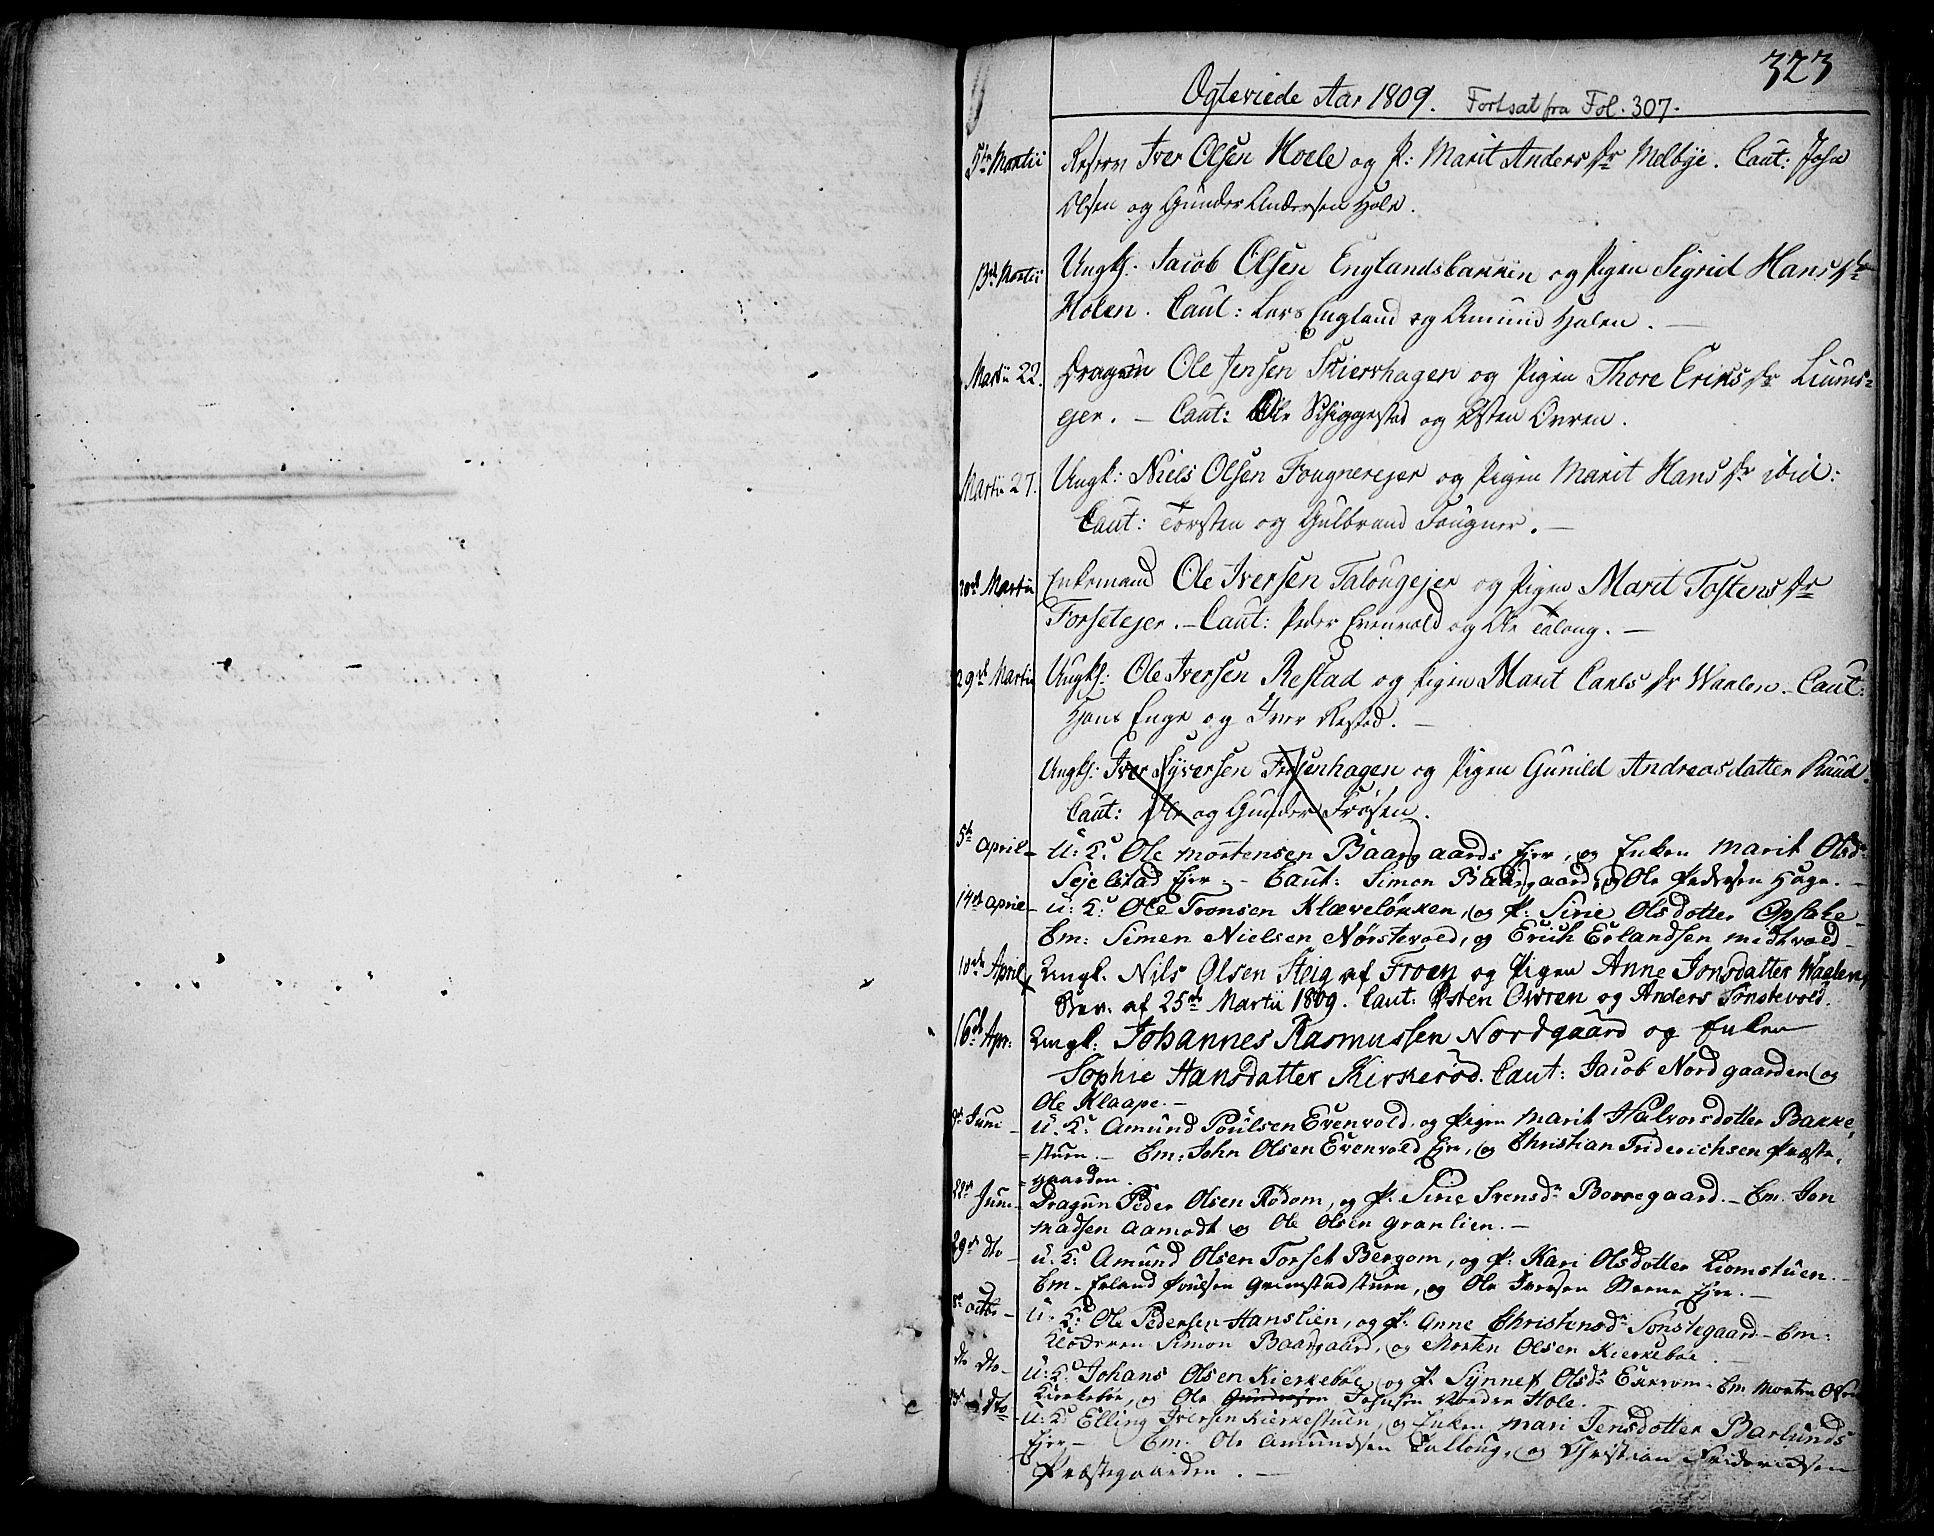 SAH, Gausdal prestekontor, Ministerialbok nr. 3, 1758-1809, s. 323